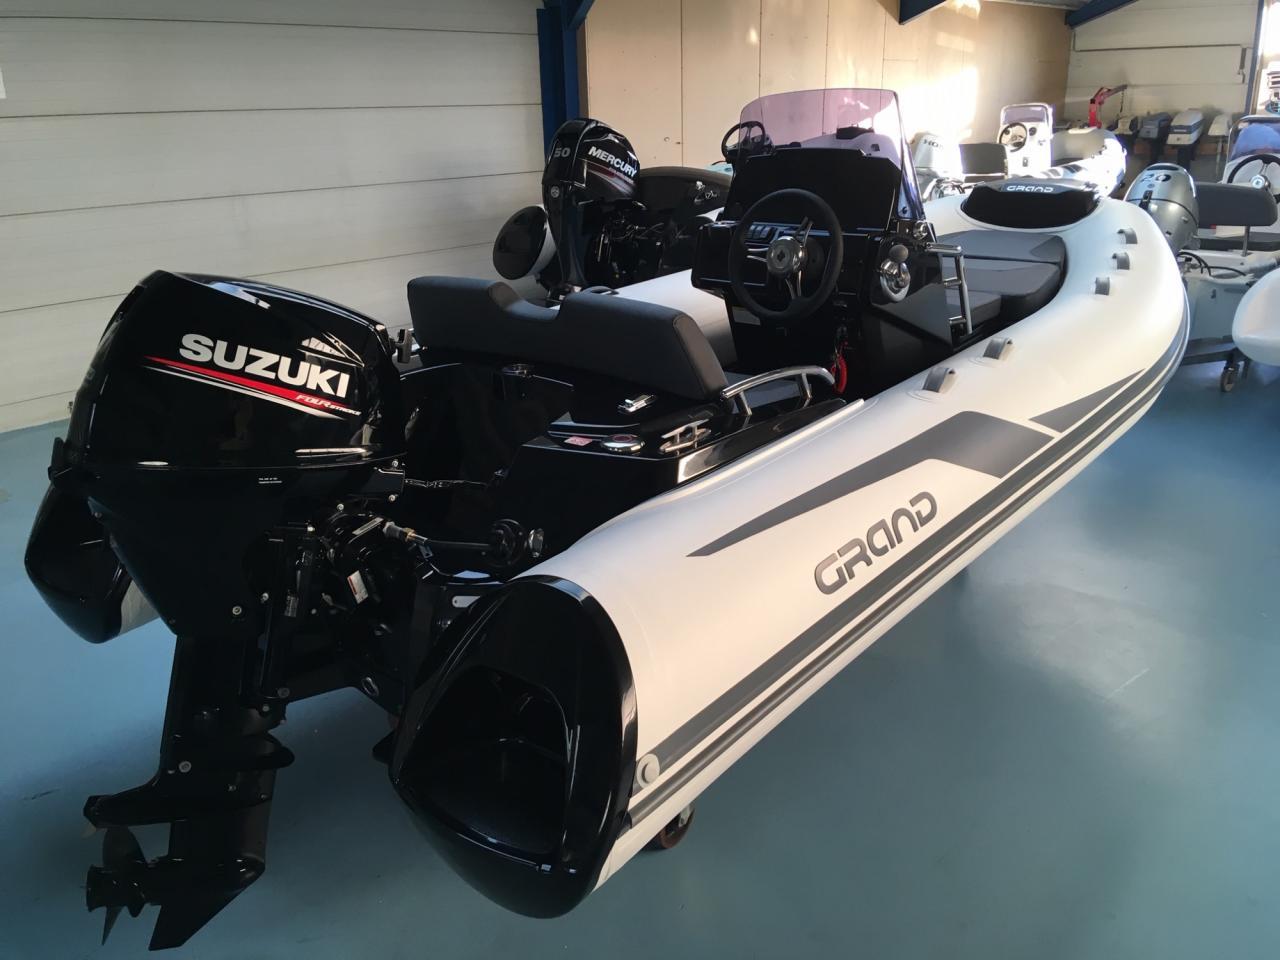 Grand G420LF met Suzuki 30 ATL 3